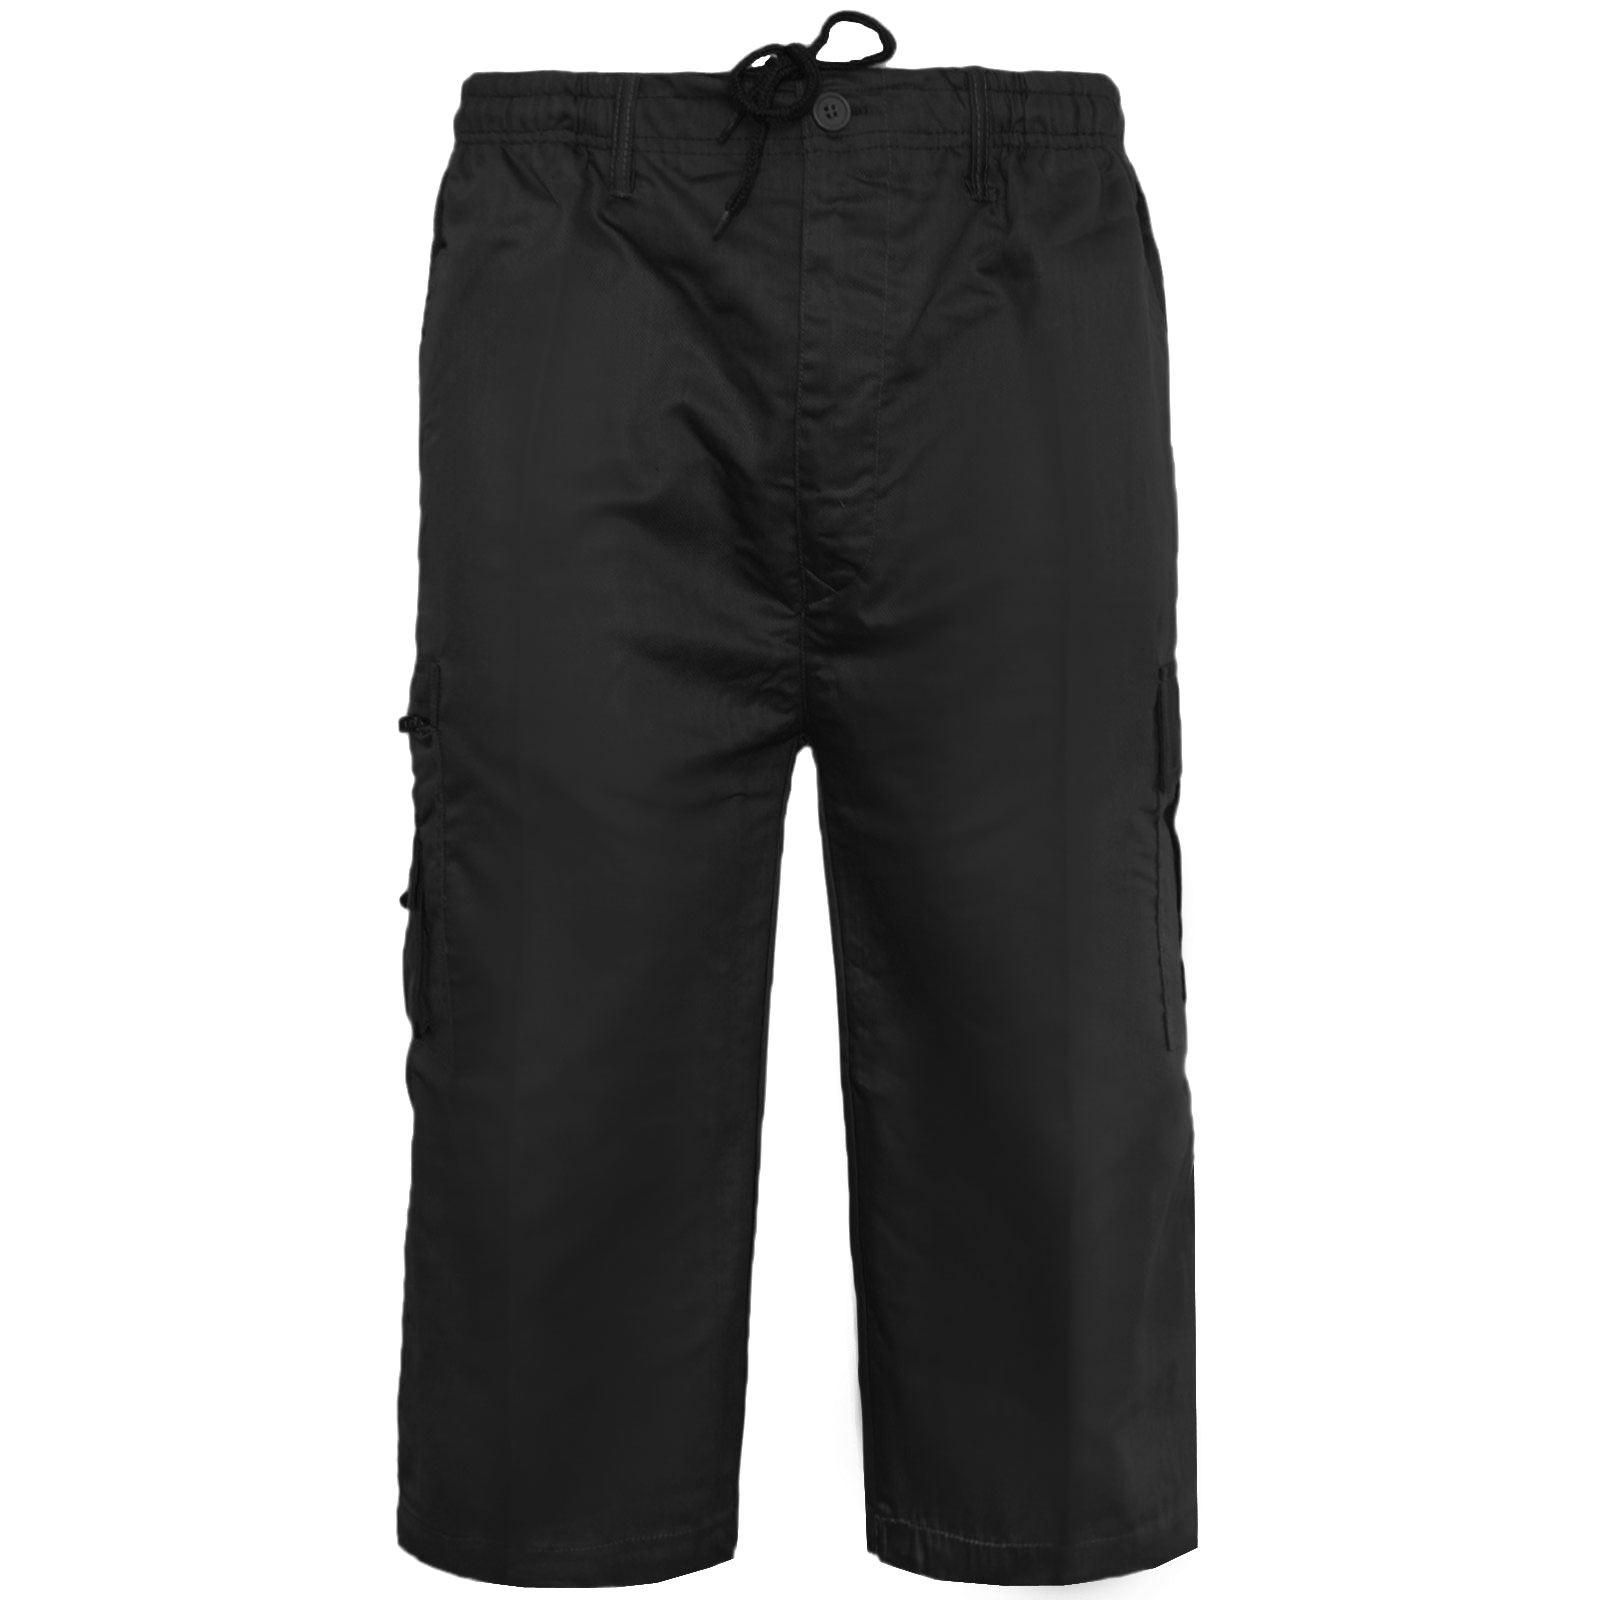 MENS PLAIN ELASTICATED 3//4 SHORTS CARGO COMBAT POCKETS SUMMER BEACH COTTON PANTS